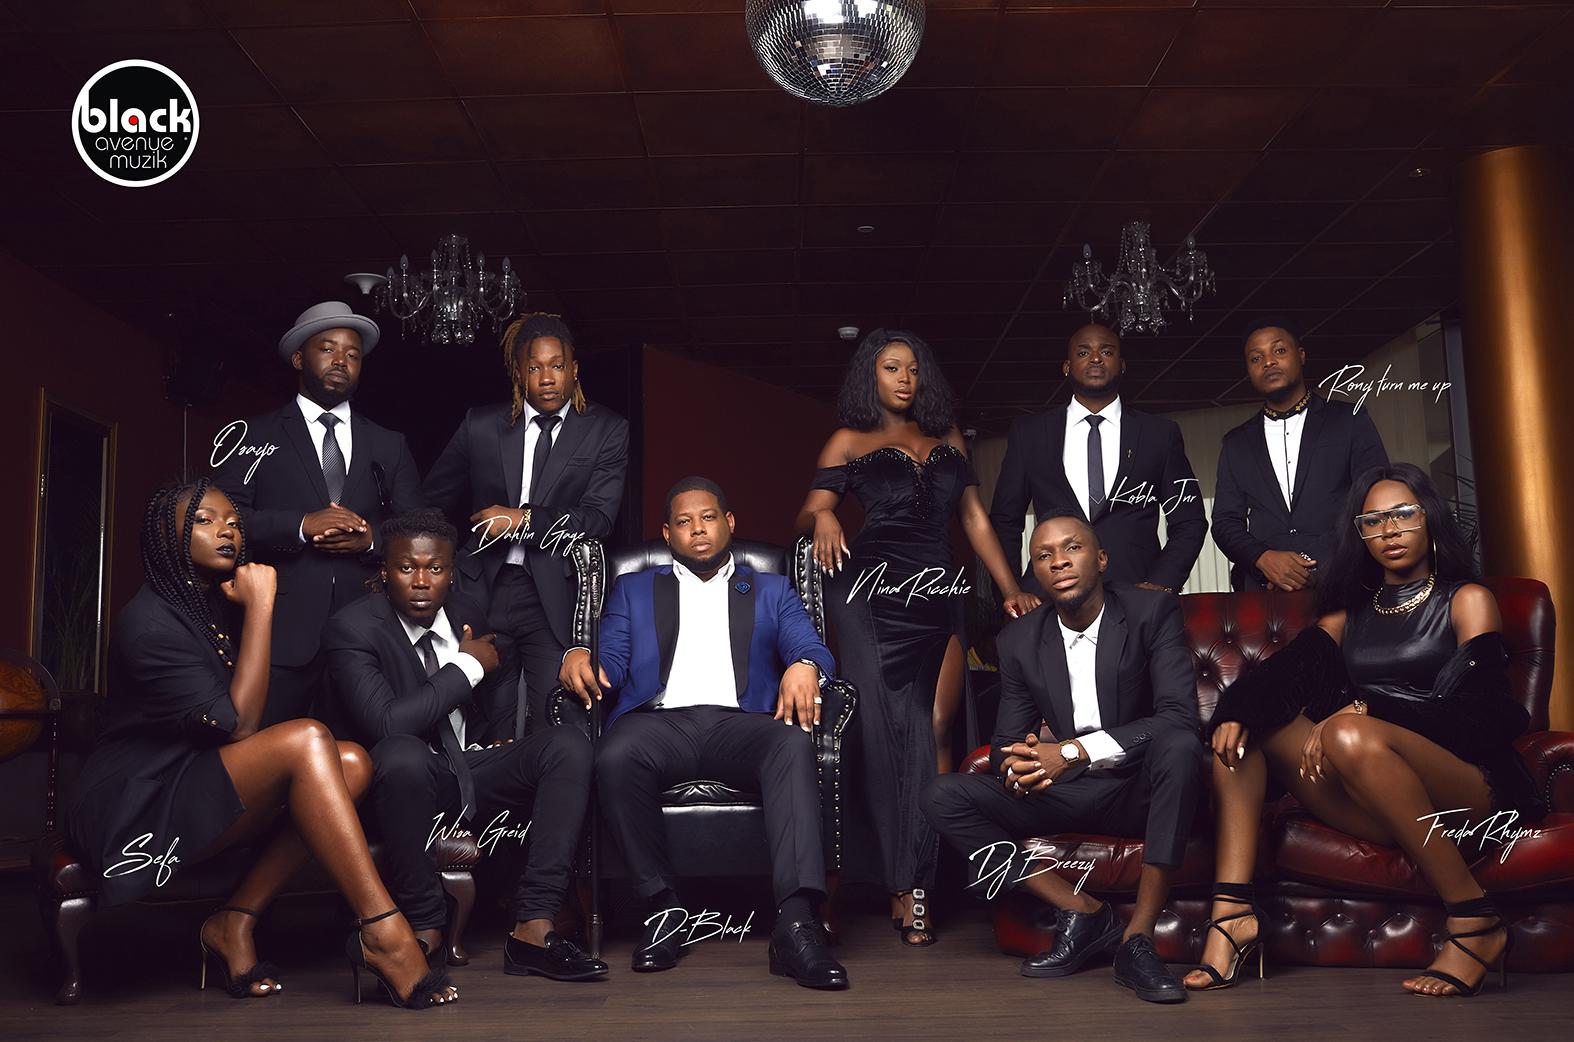 Black Avenue Muzik; the fast rising African record label from Ghana